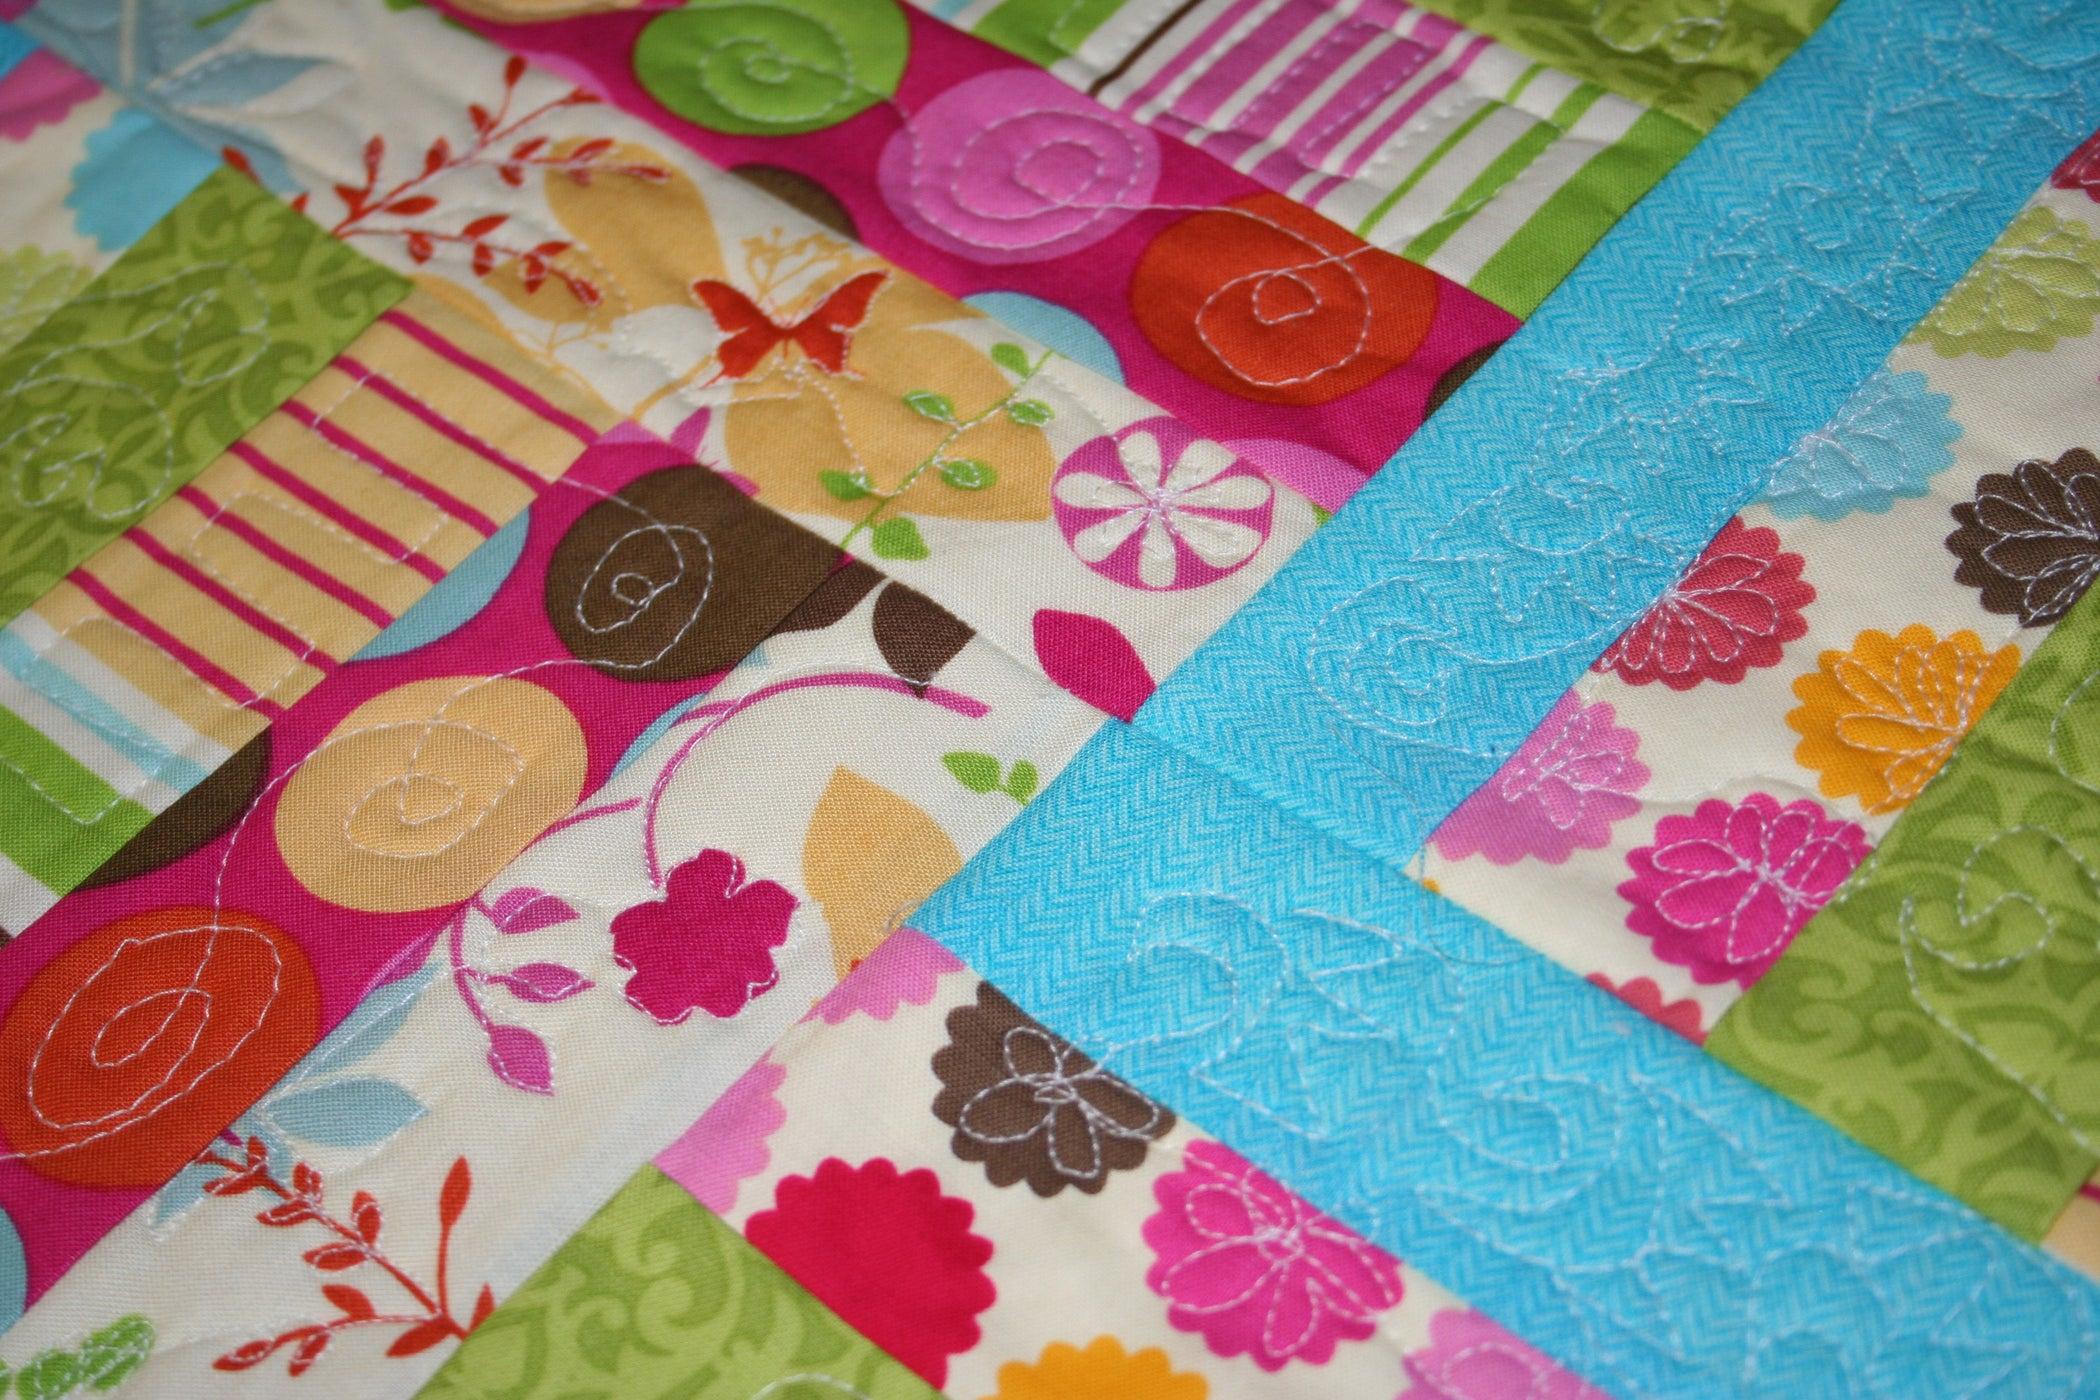 Quilt As You Go Patterns Magnificent Design Ideas